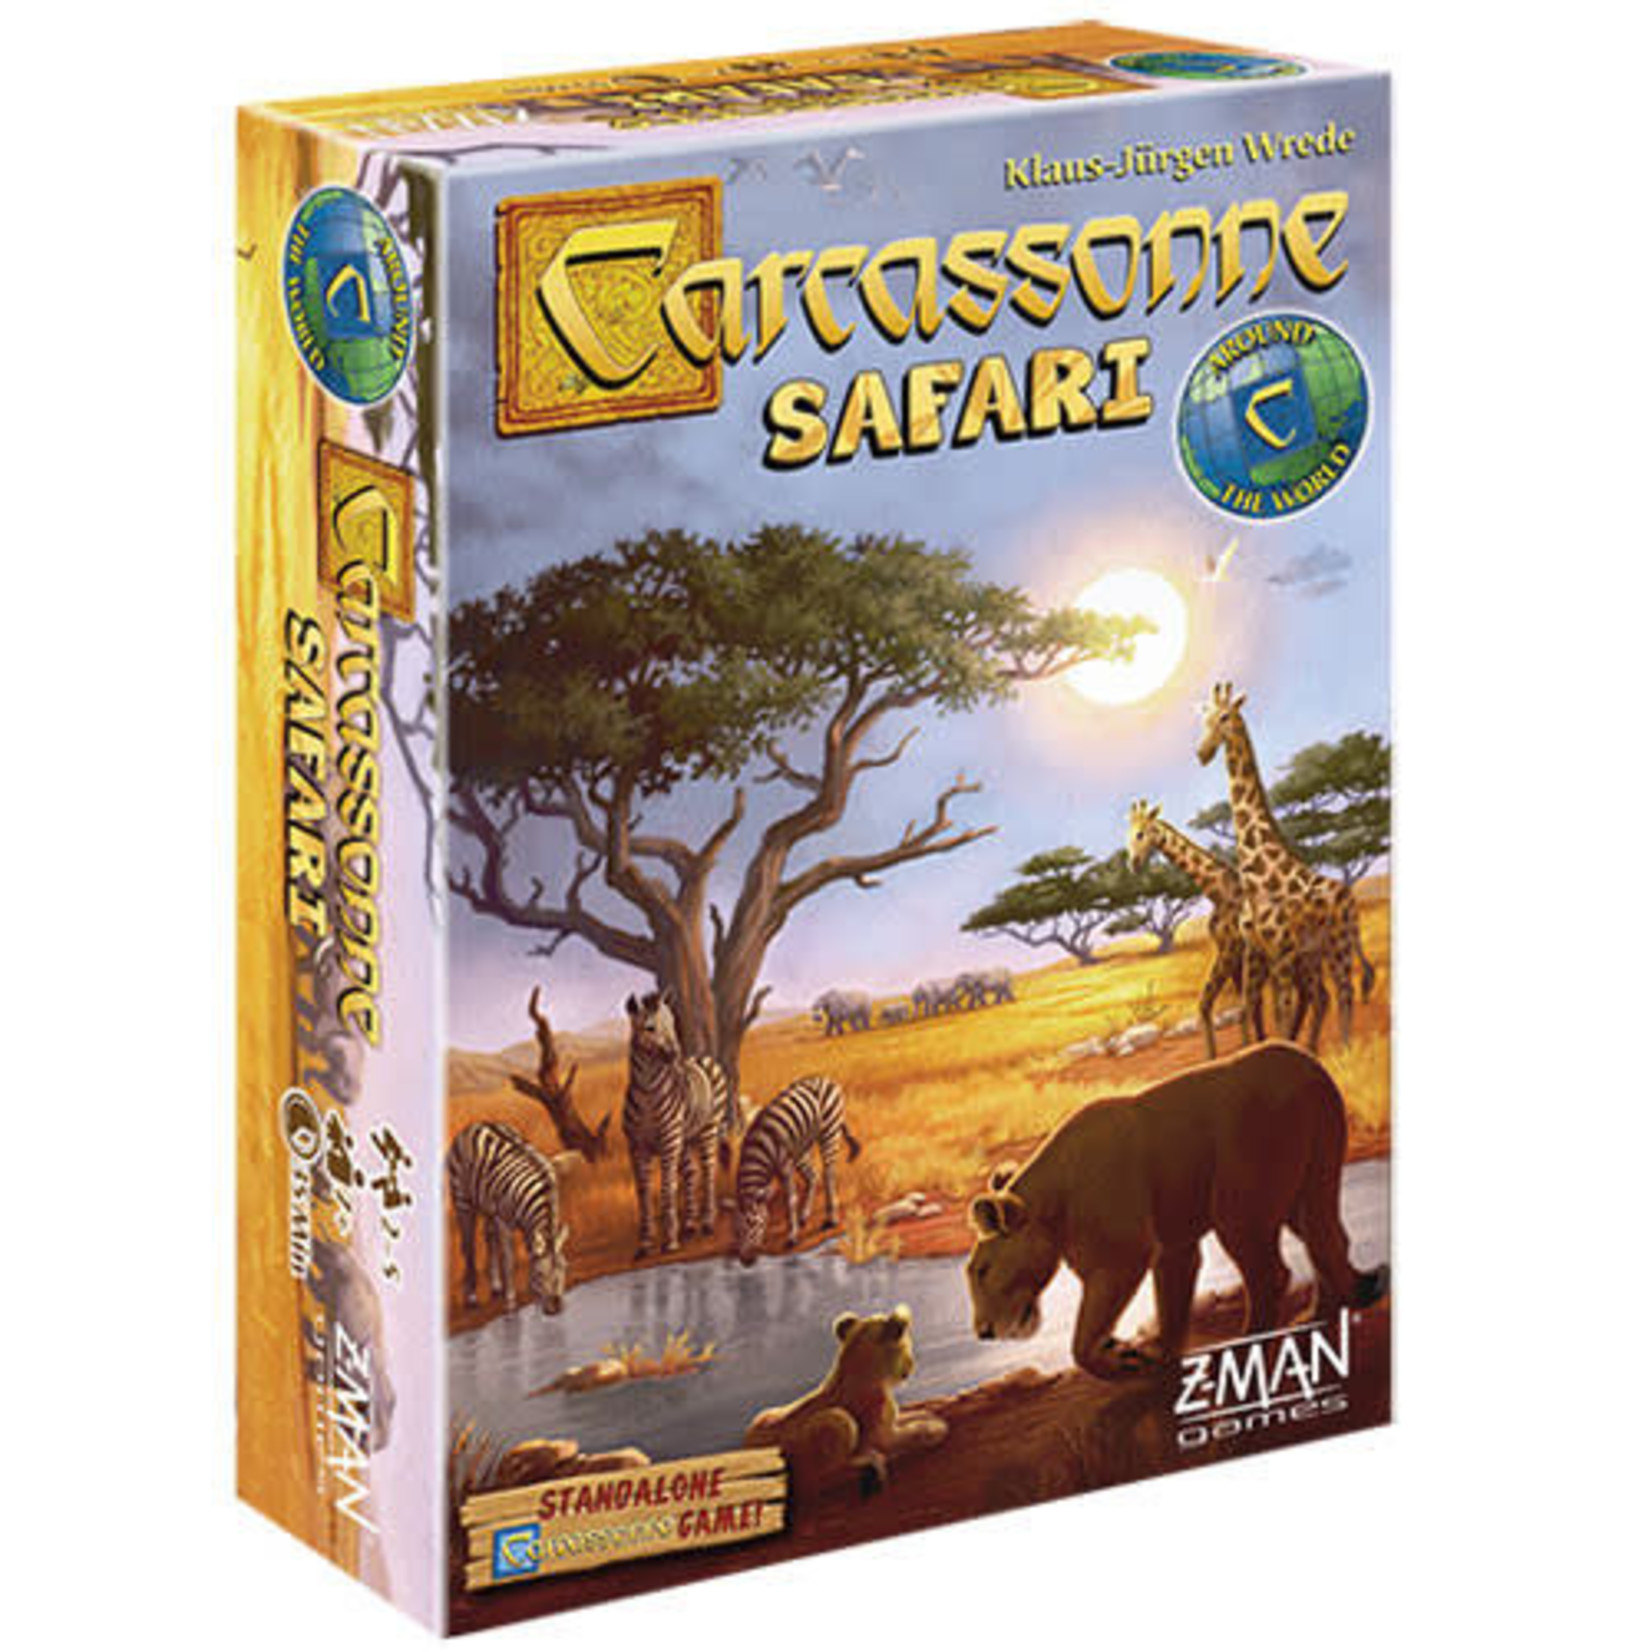 Carcassonne Safari Board Game (Standalone)